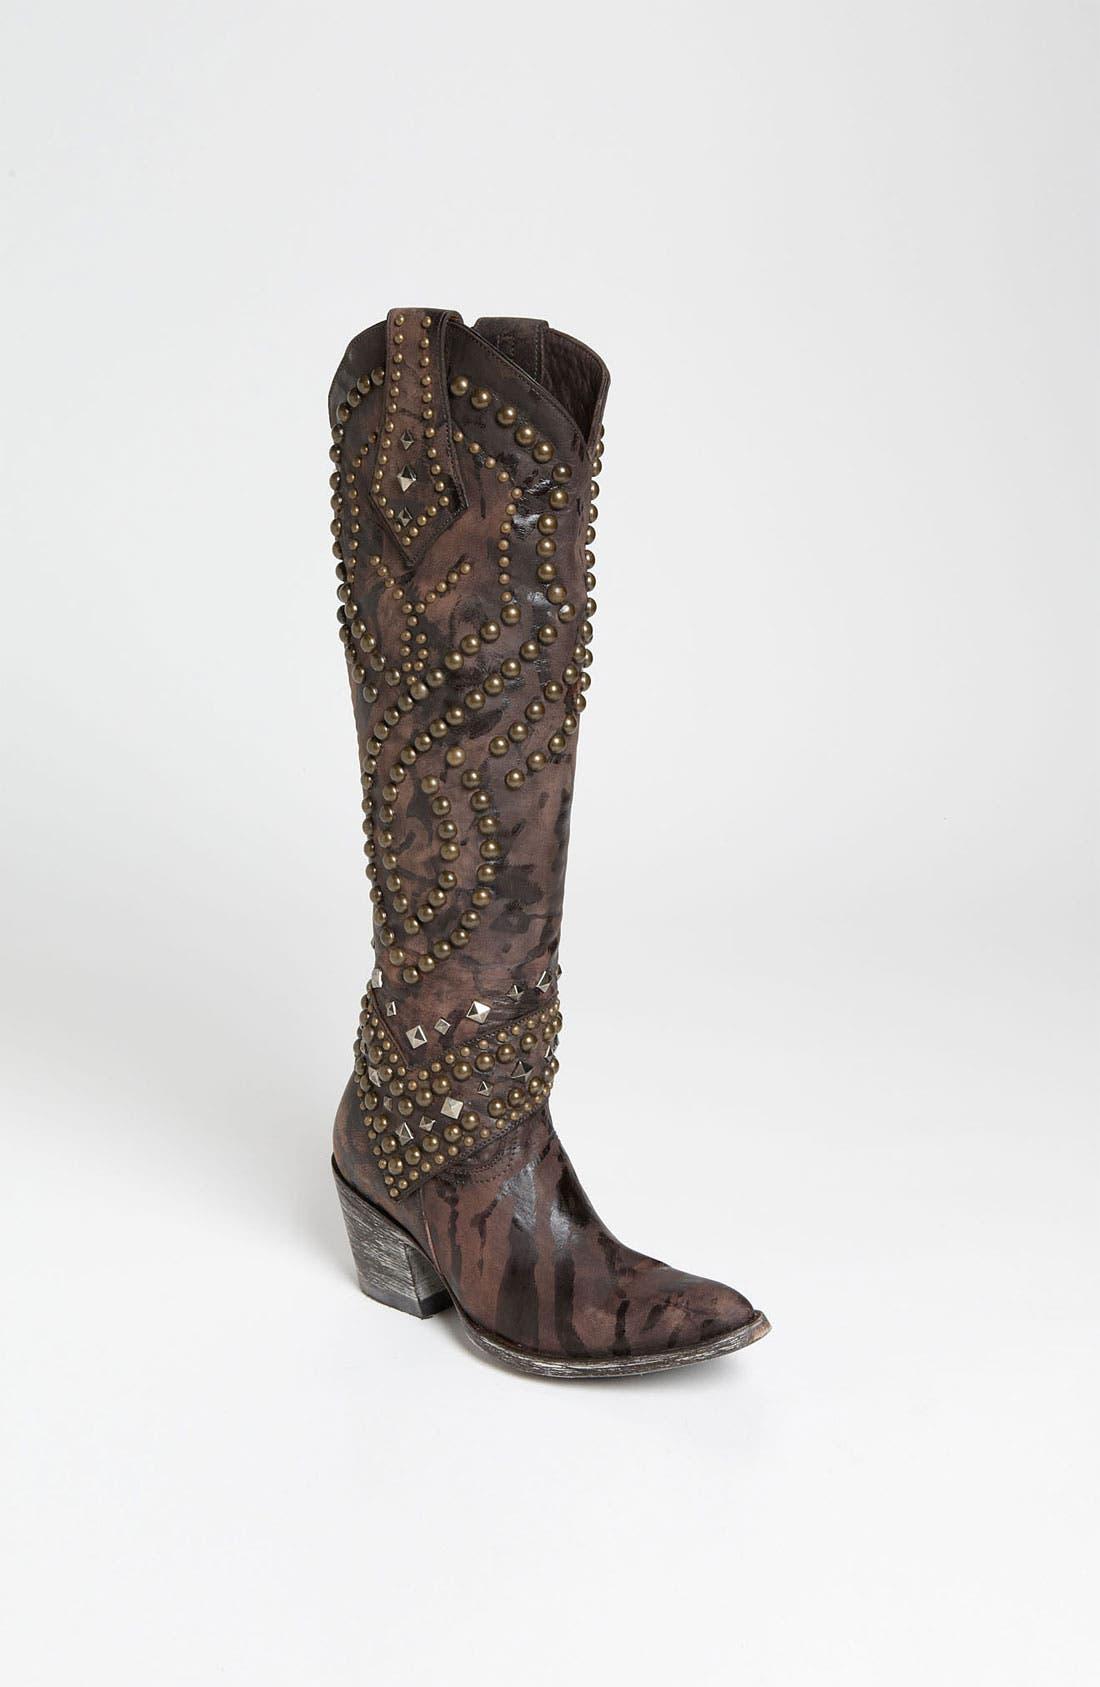 Alternate Image 1 Selected - Old Gringo 'Belinda' Boot